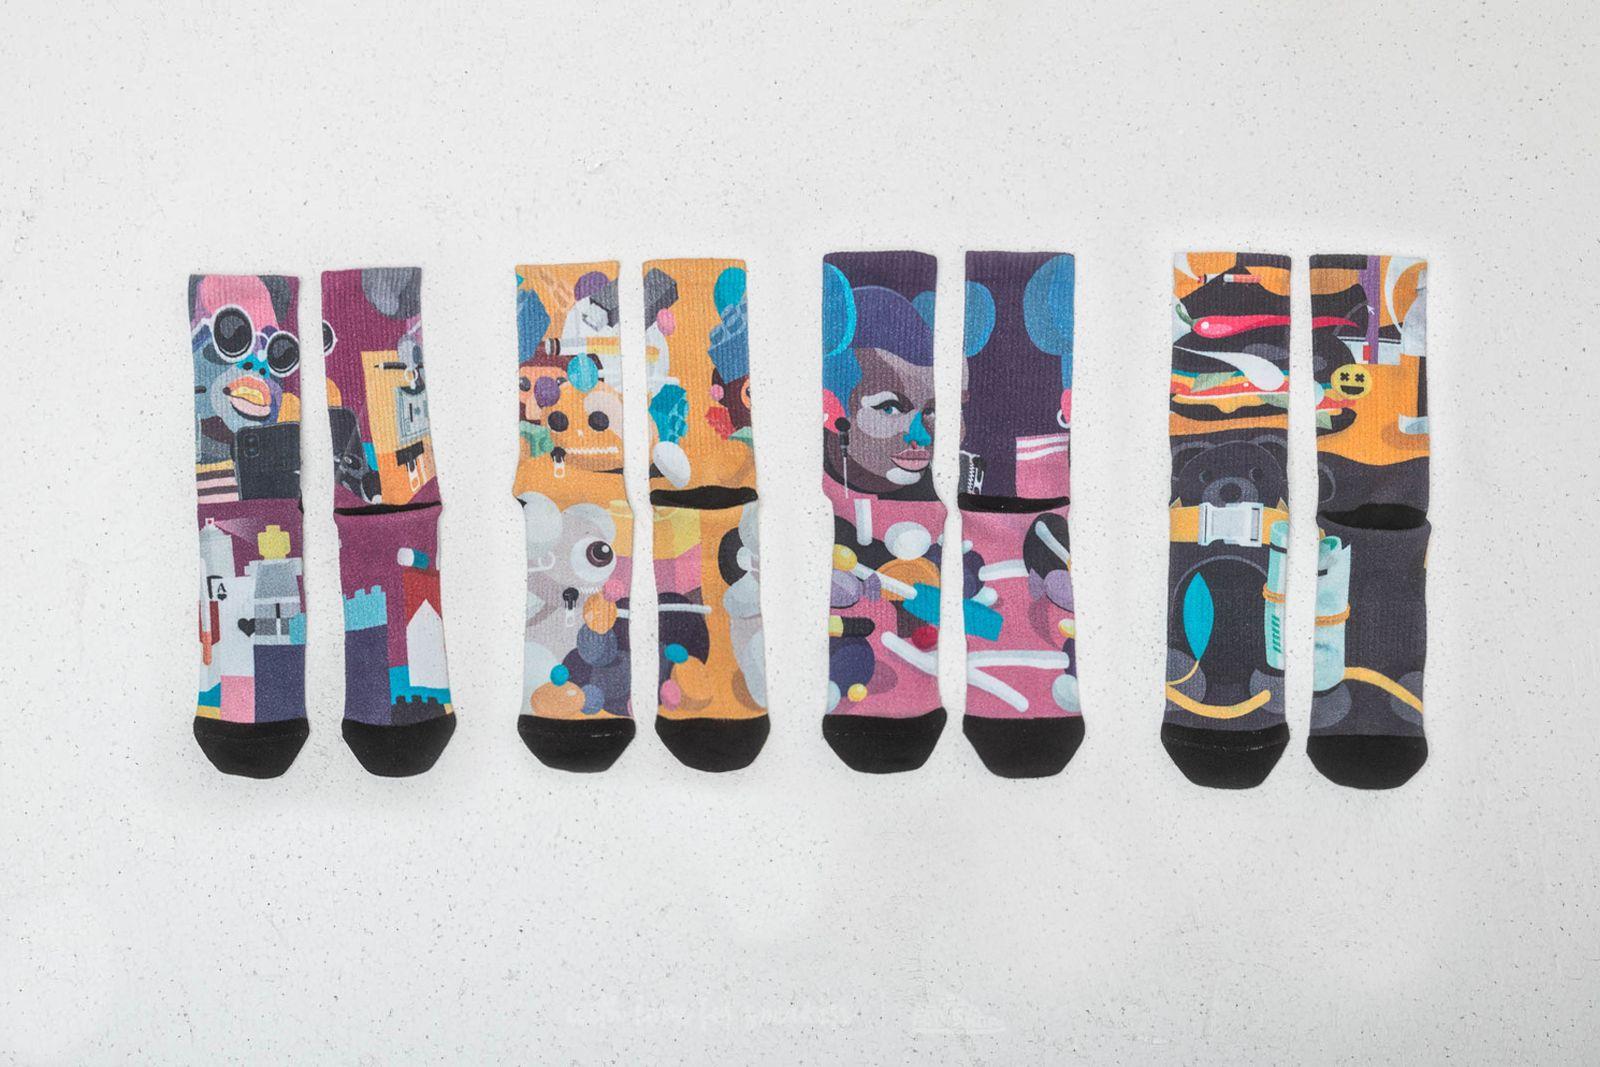 Moon Socks x Marek Mraz Pack Socks